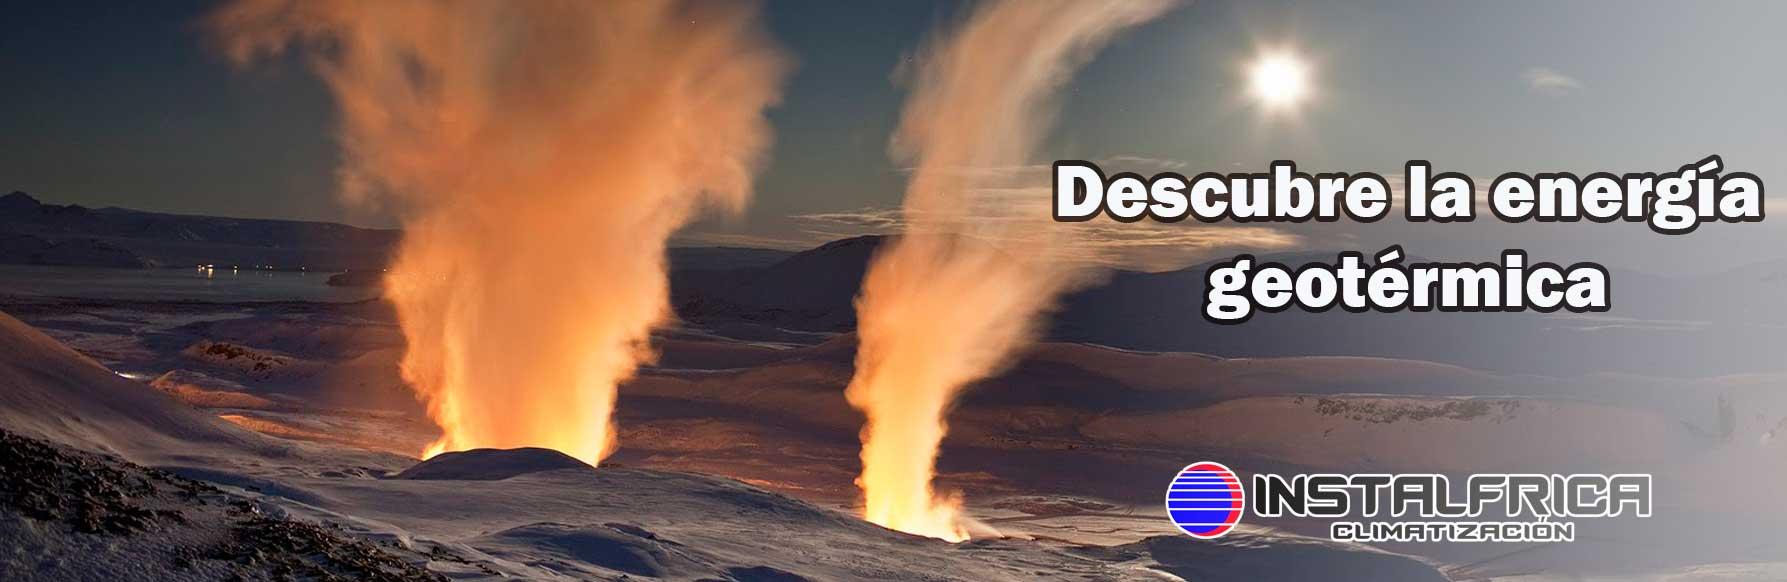 energía geotérmica suelo radiante murcia